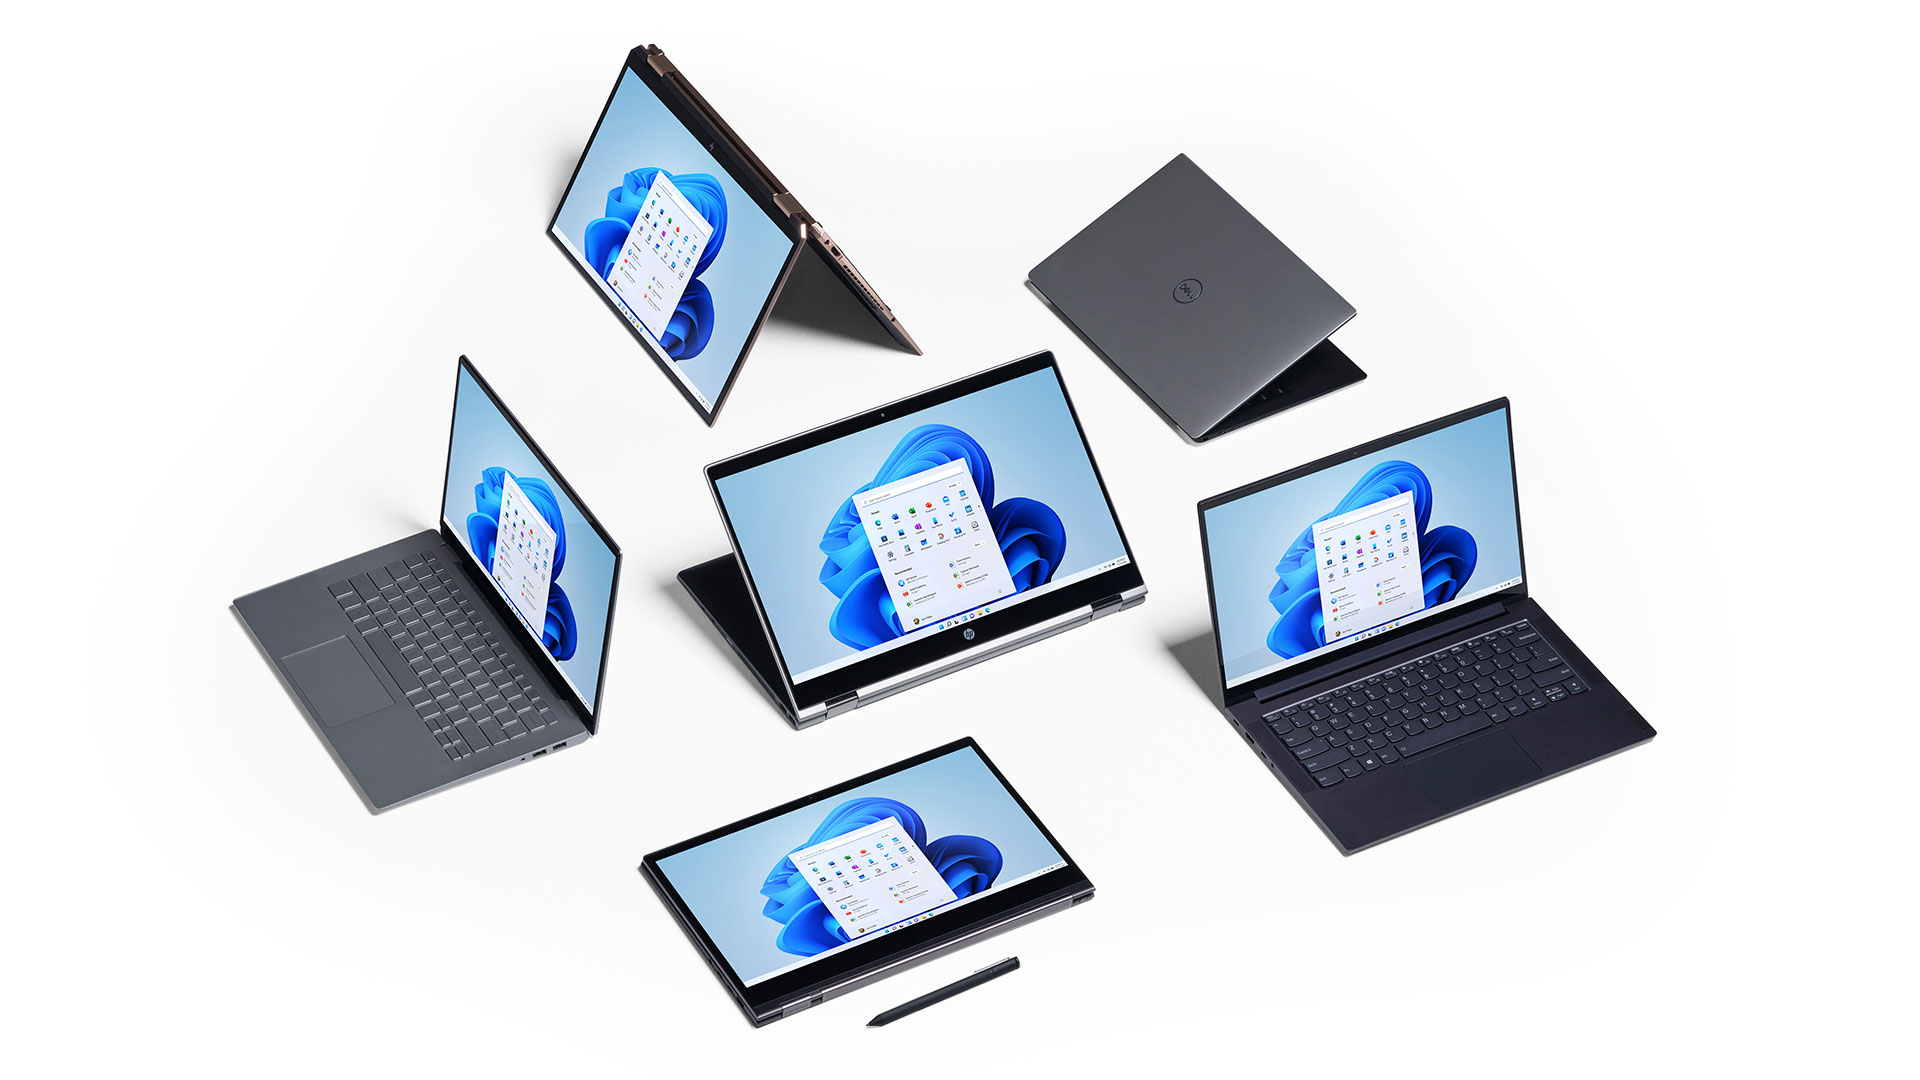 Array of 6 Windows 11 computers